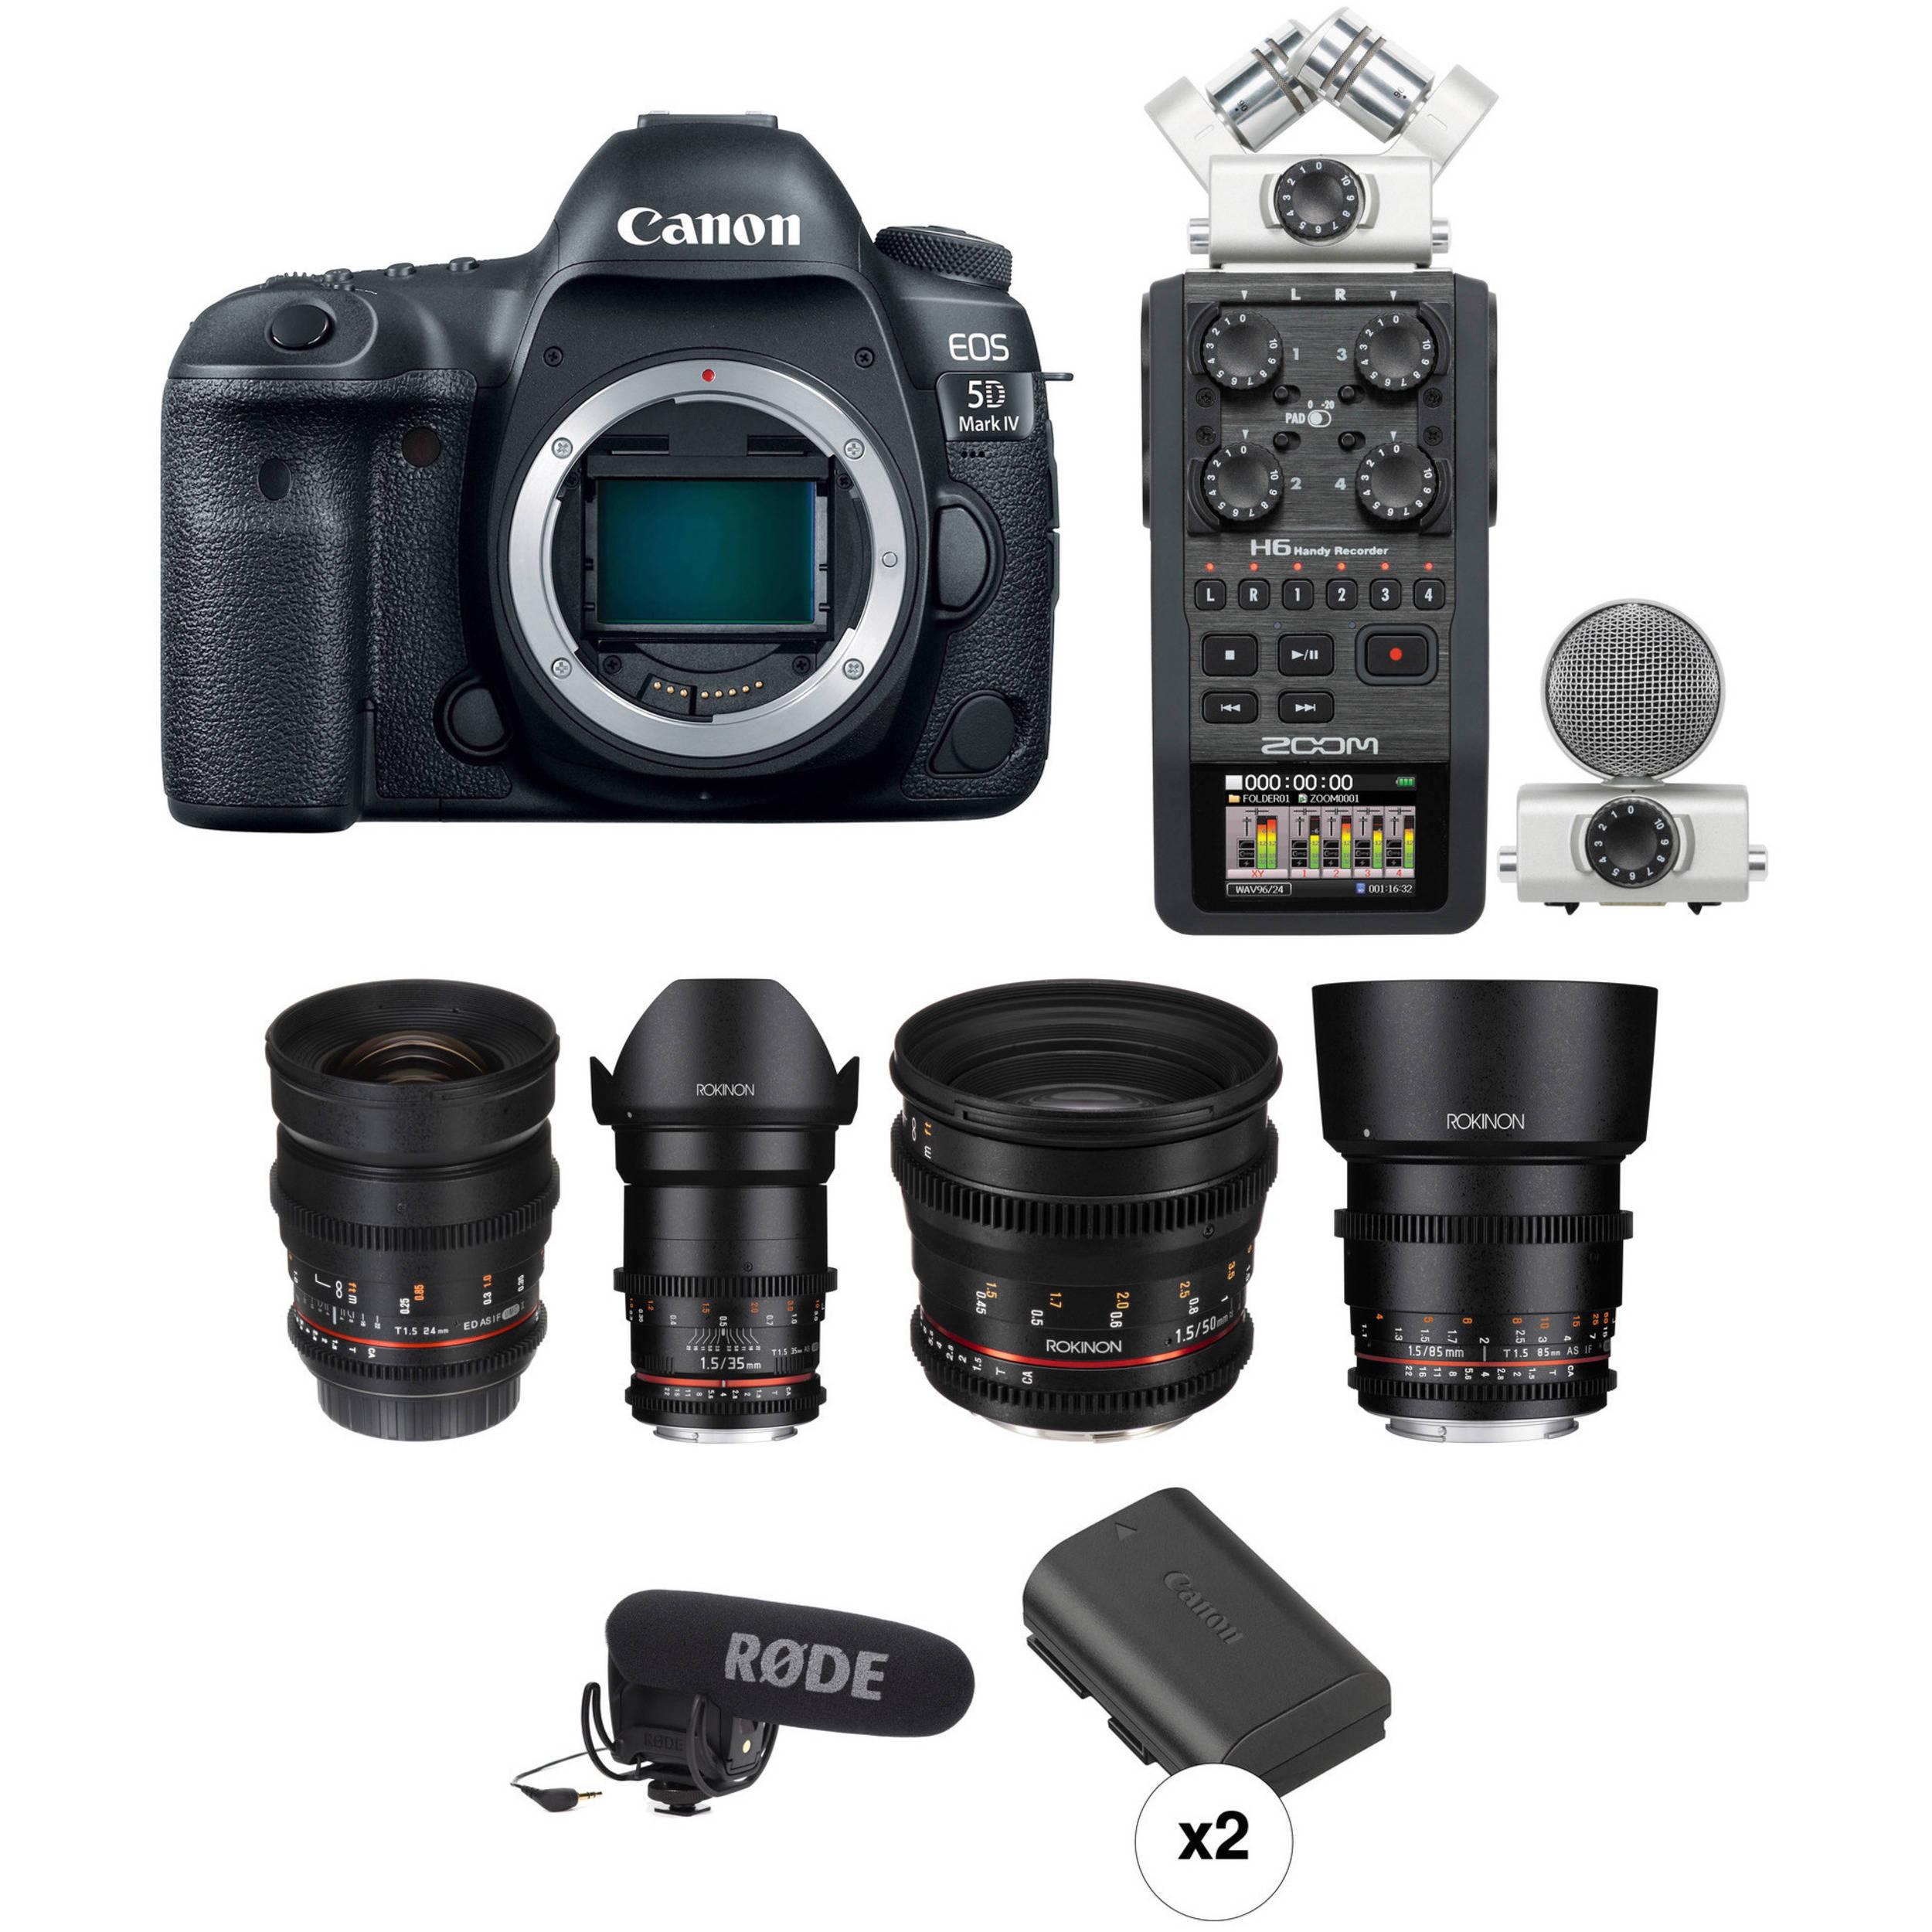 EOS 5D Mark IV DSLR Camera with Rokinon Cine Lenses Bundle